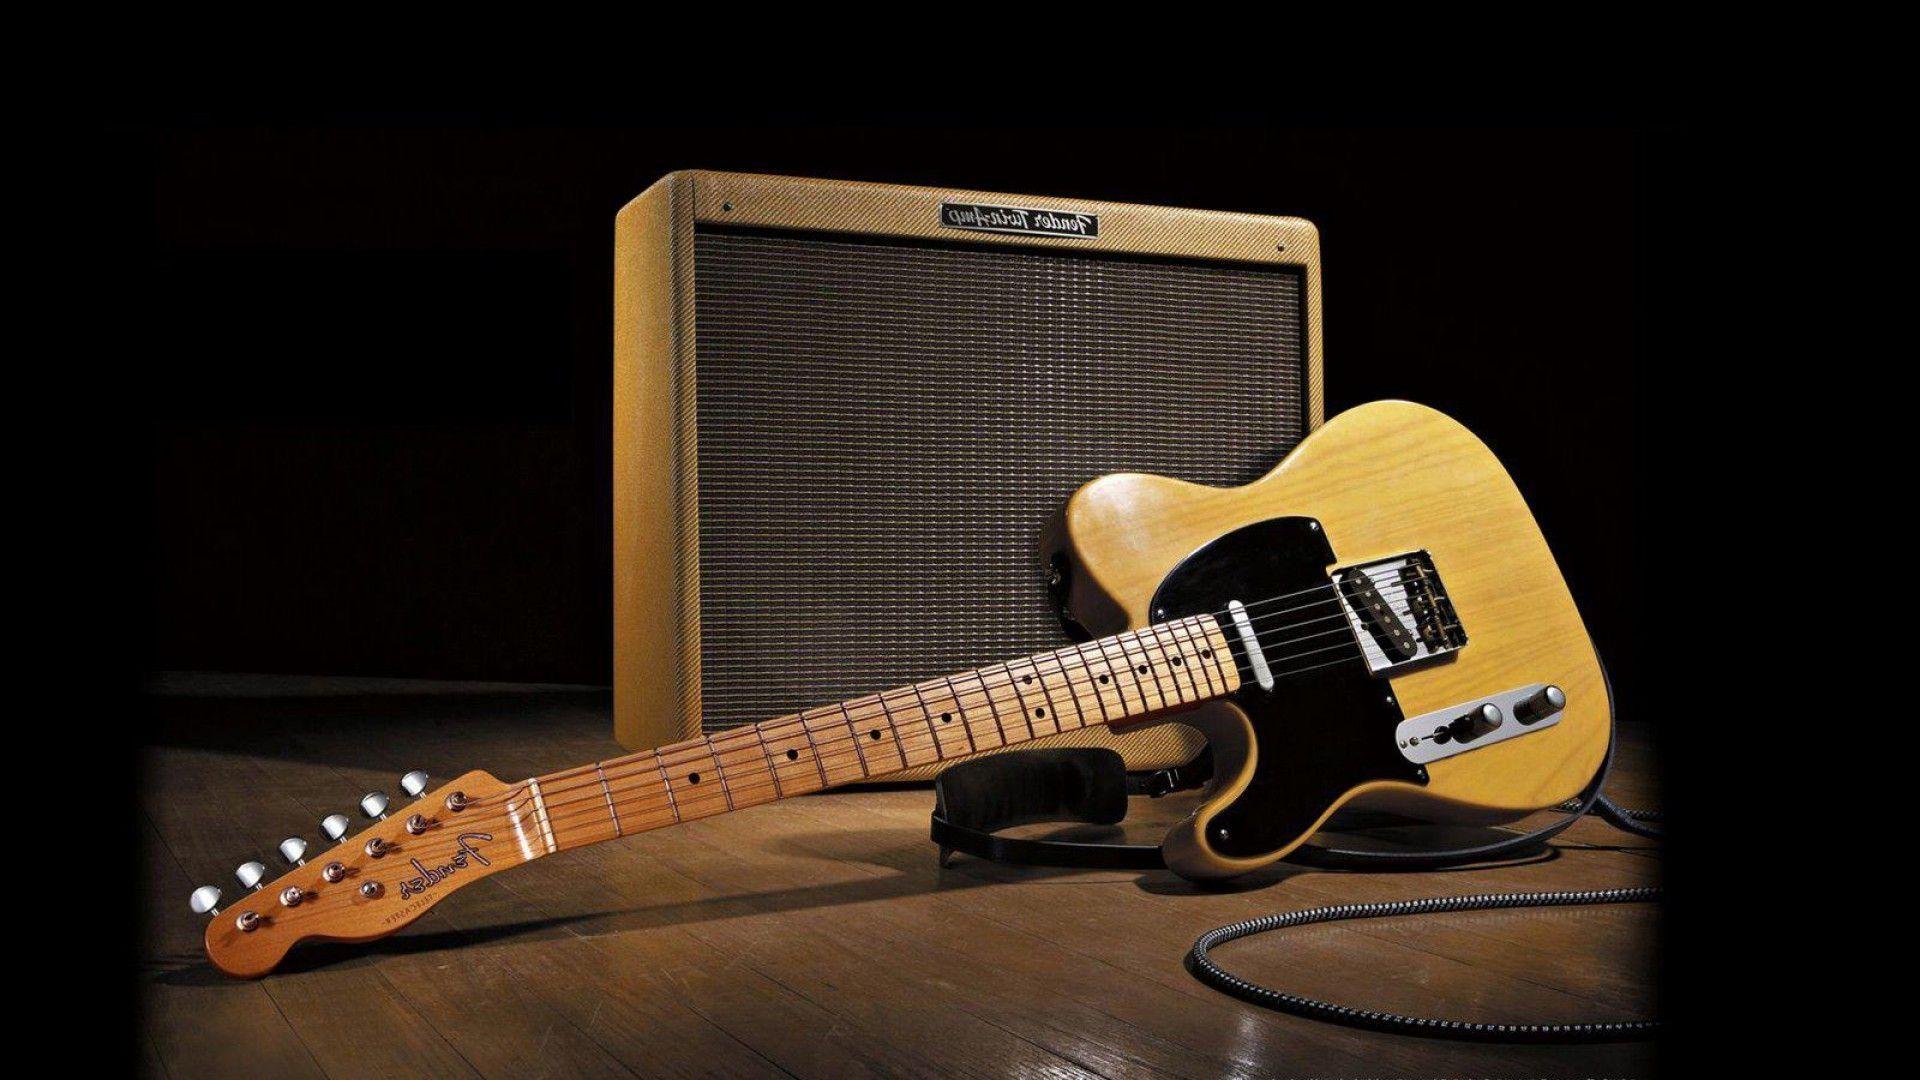 51 Fender Guitar Hd Wallpapers Wallpaperboat